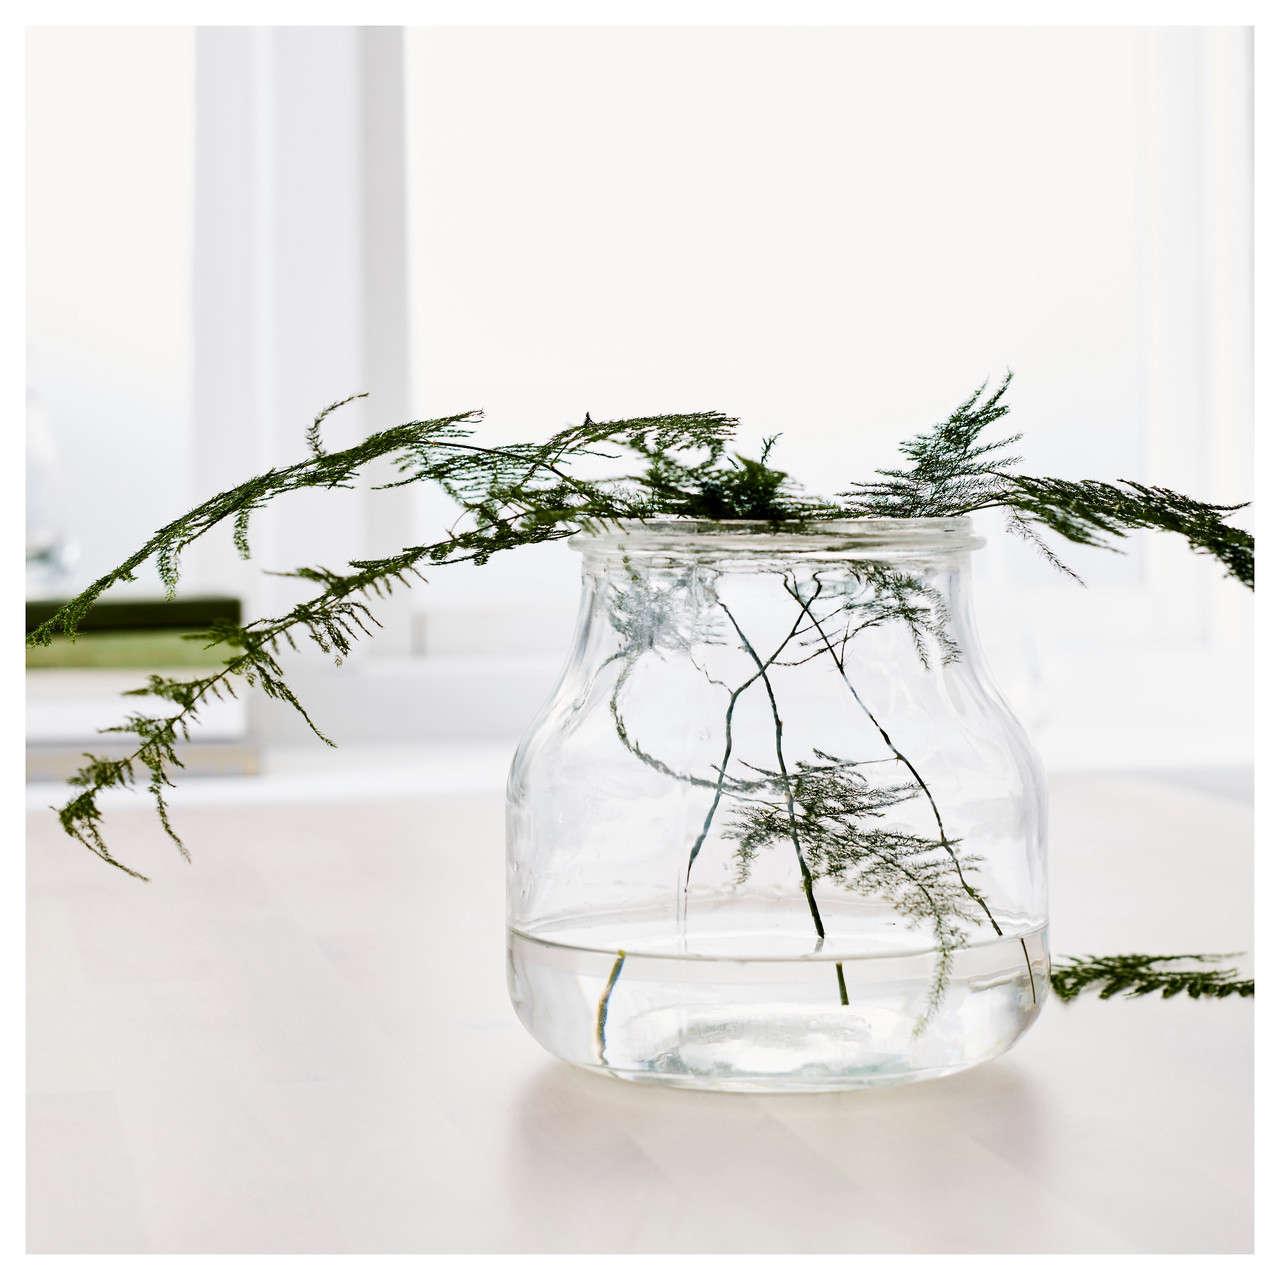 ikea-ensdig-vase